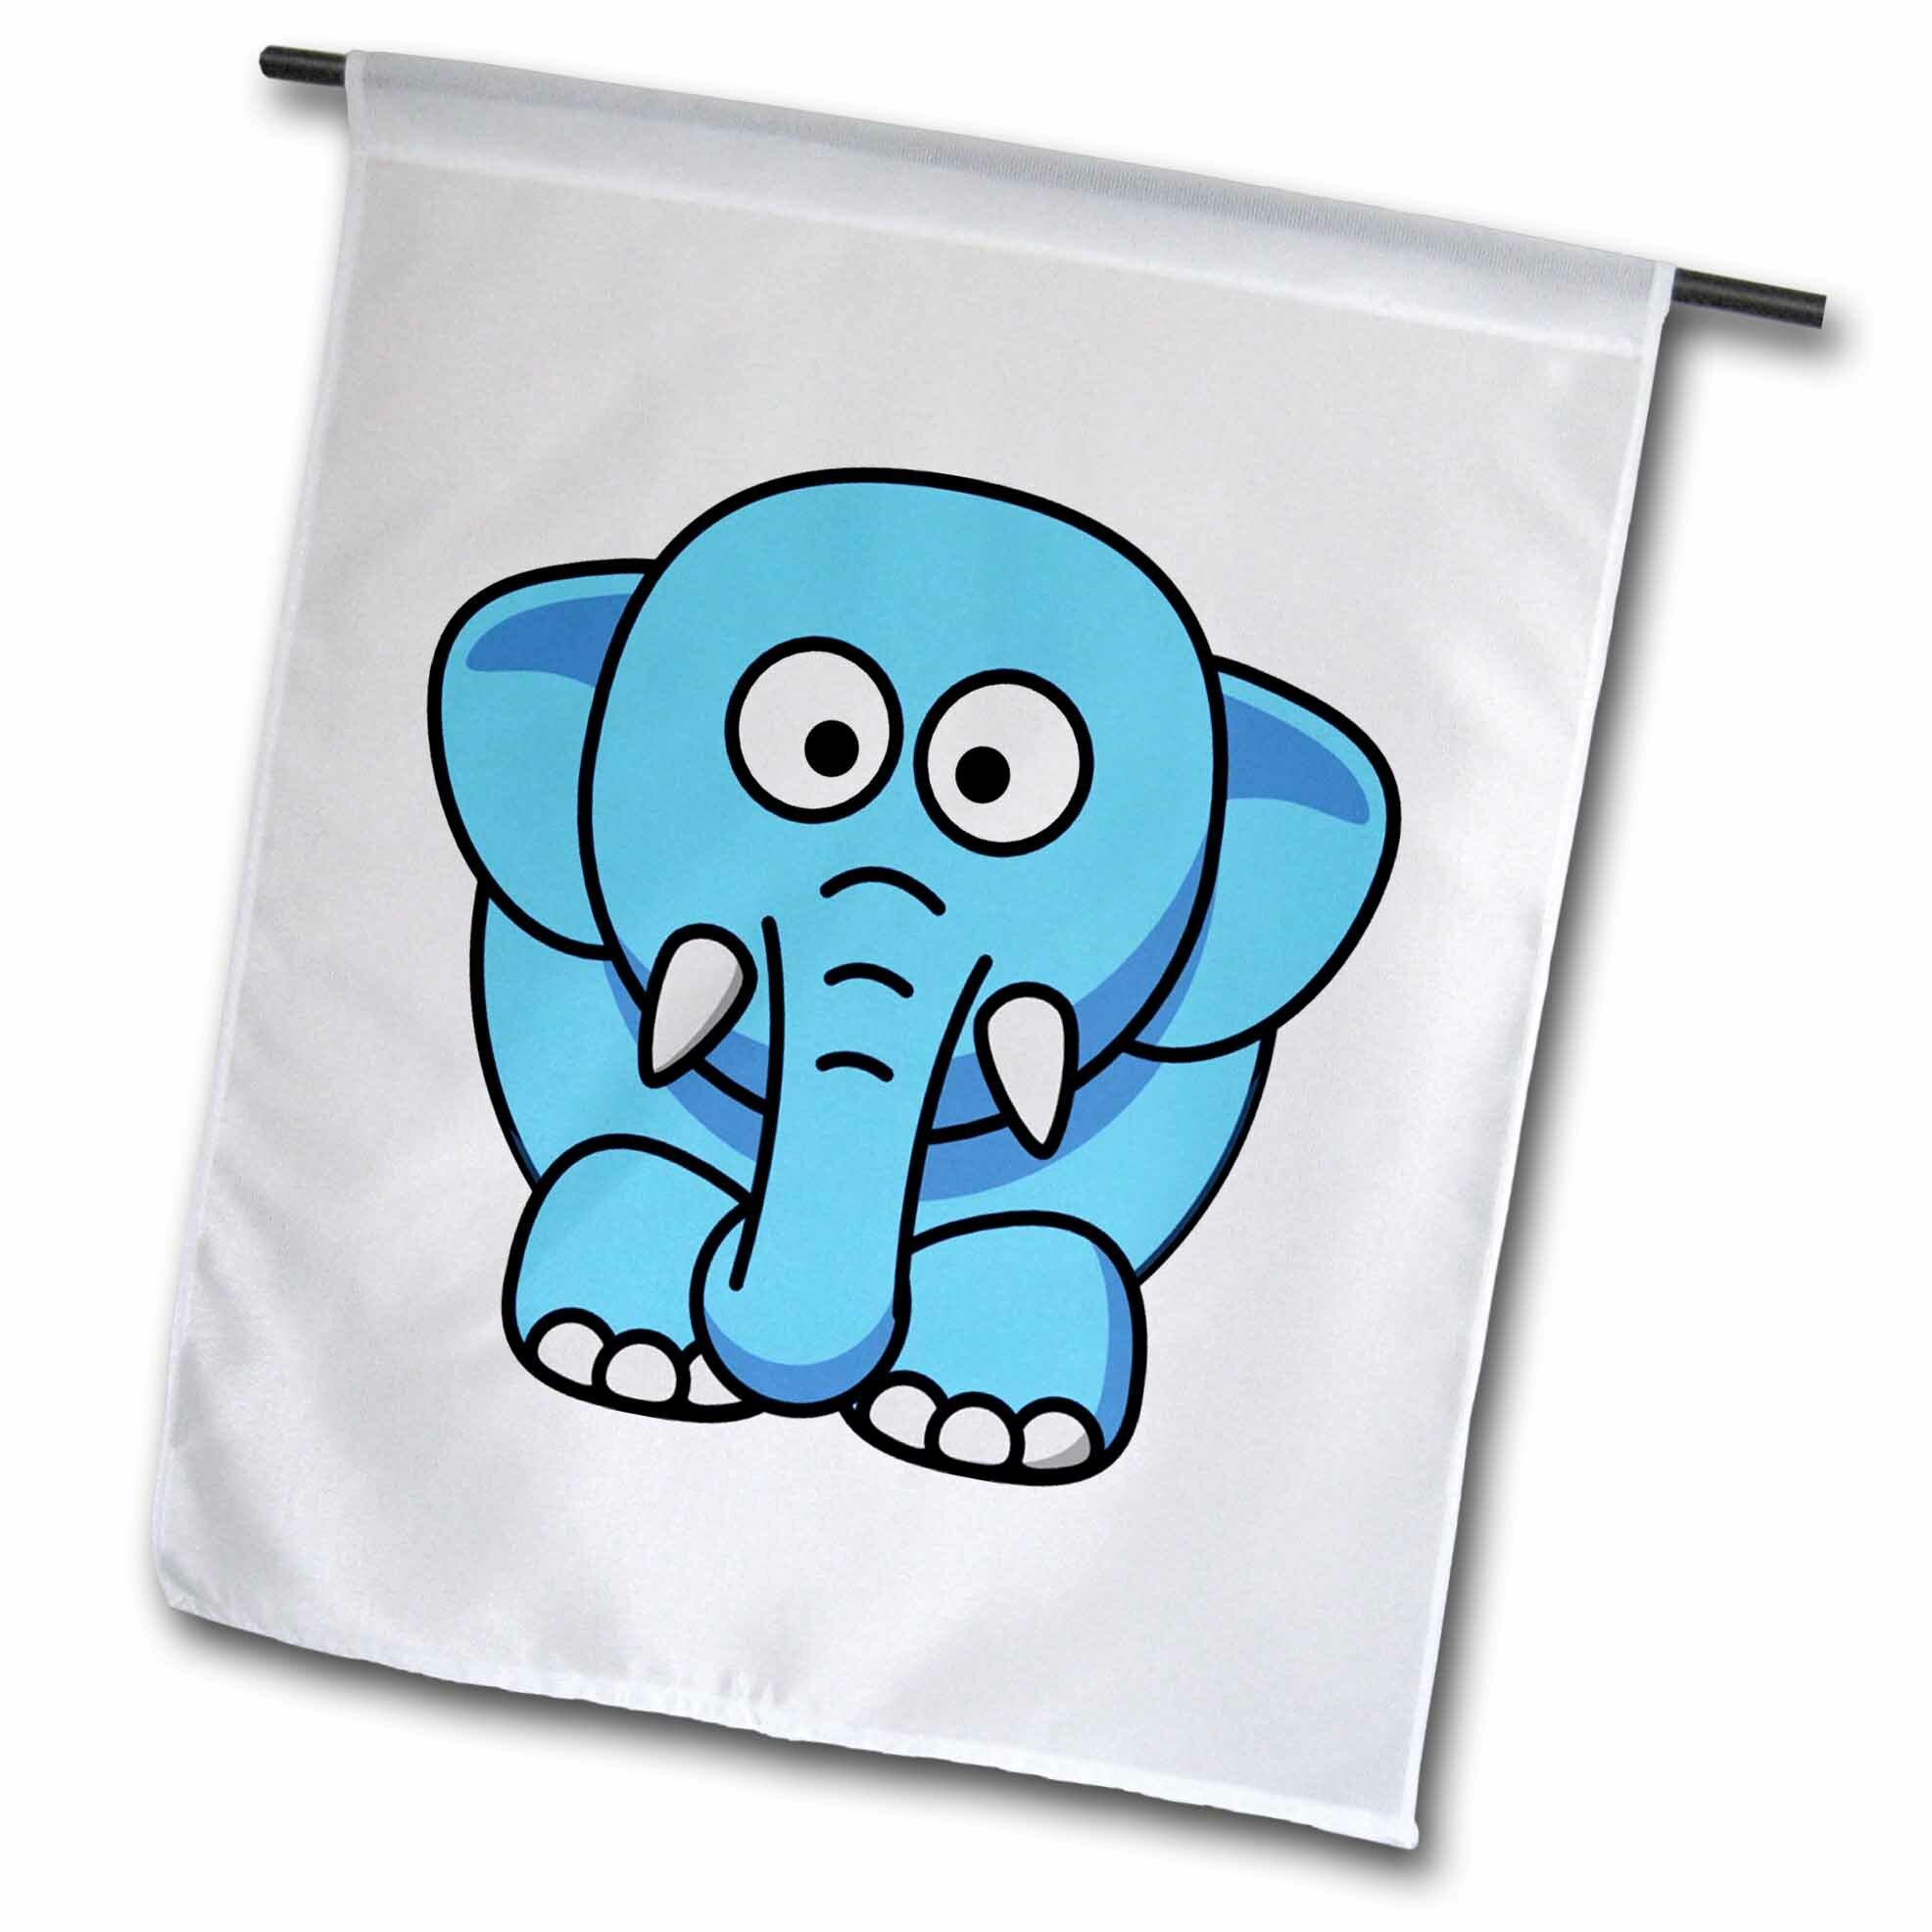 3drose Cute Baby Elephant Polyester 18 X 12 In Garden Flag Wayfair